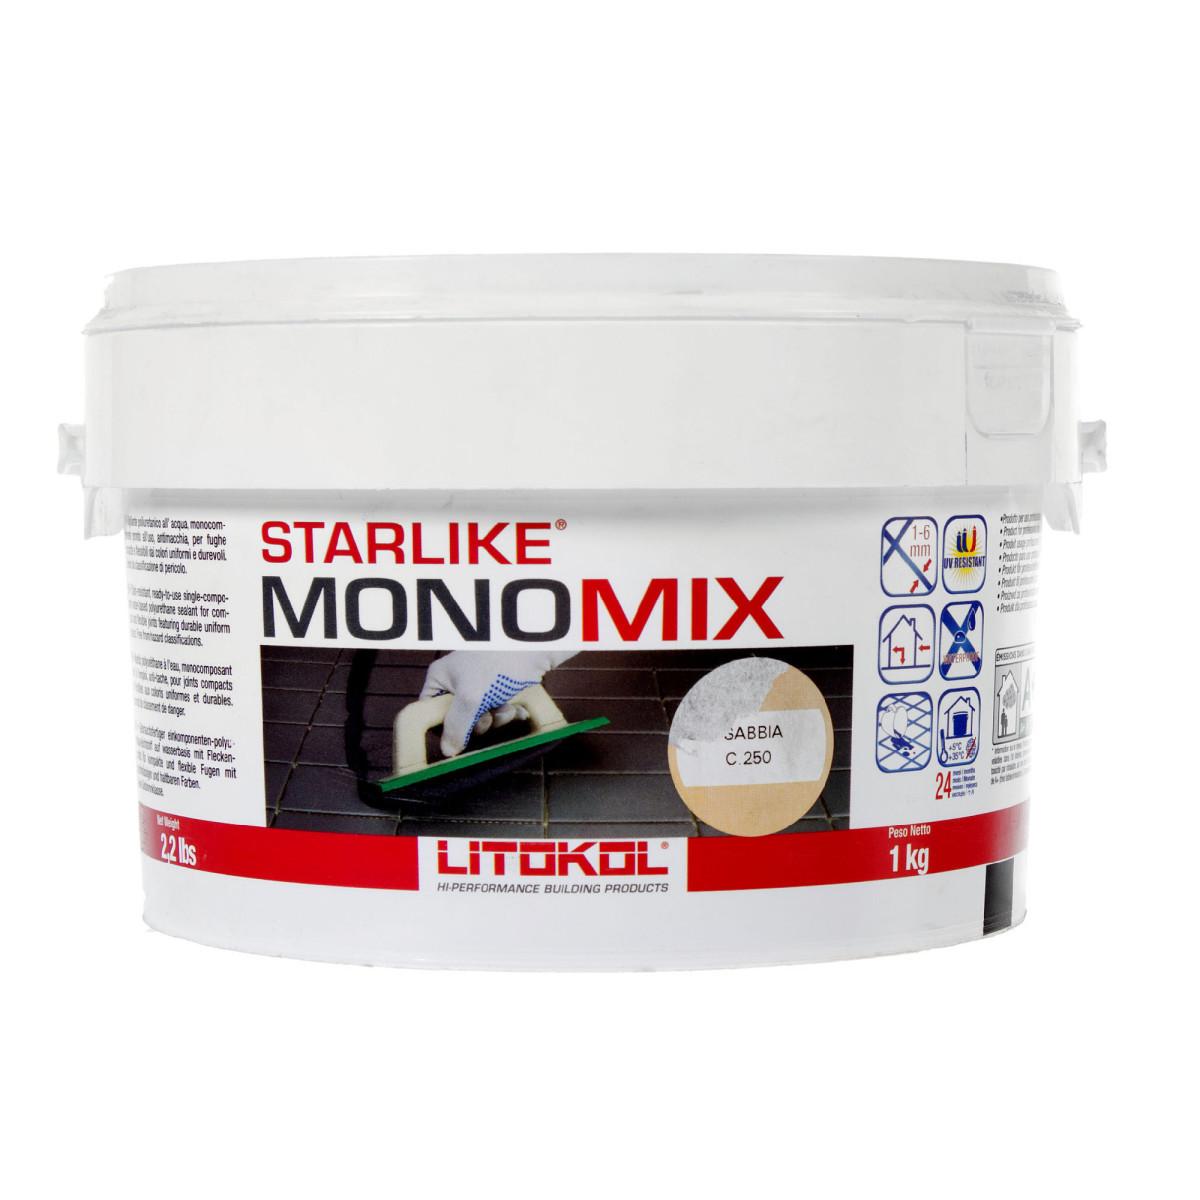 Затирка цементная Starlike Monomix C250 1 кг цвет бежевый